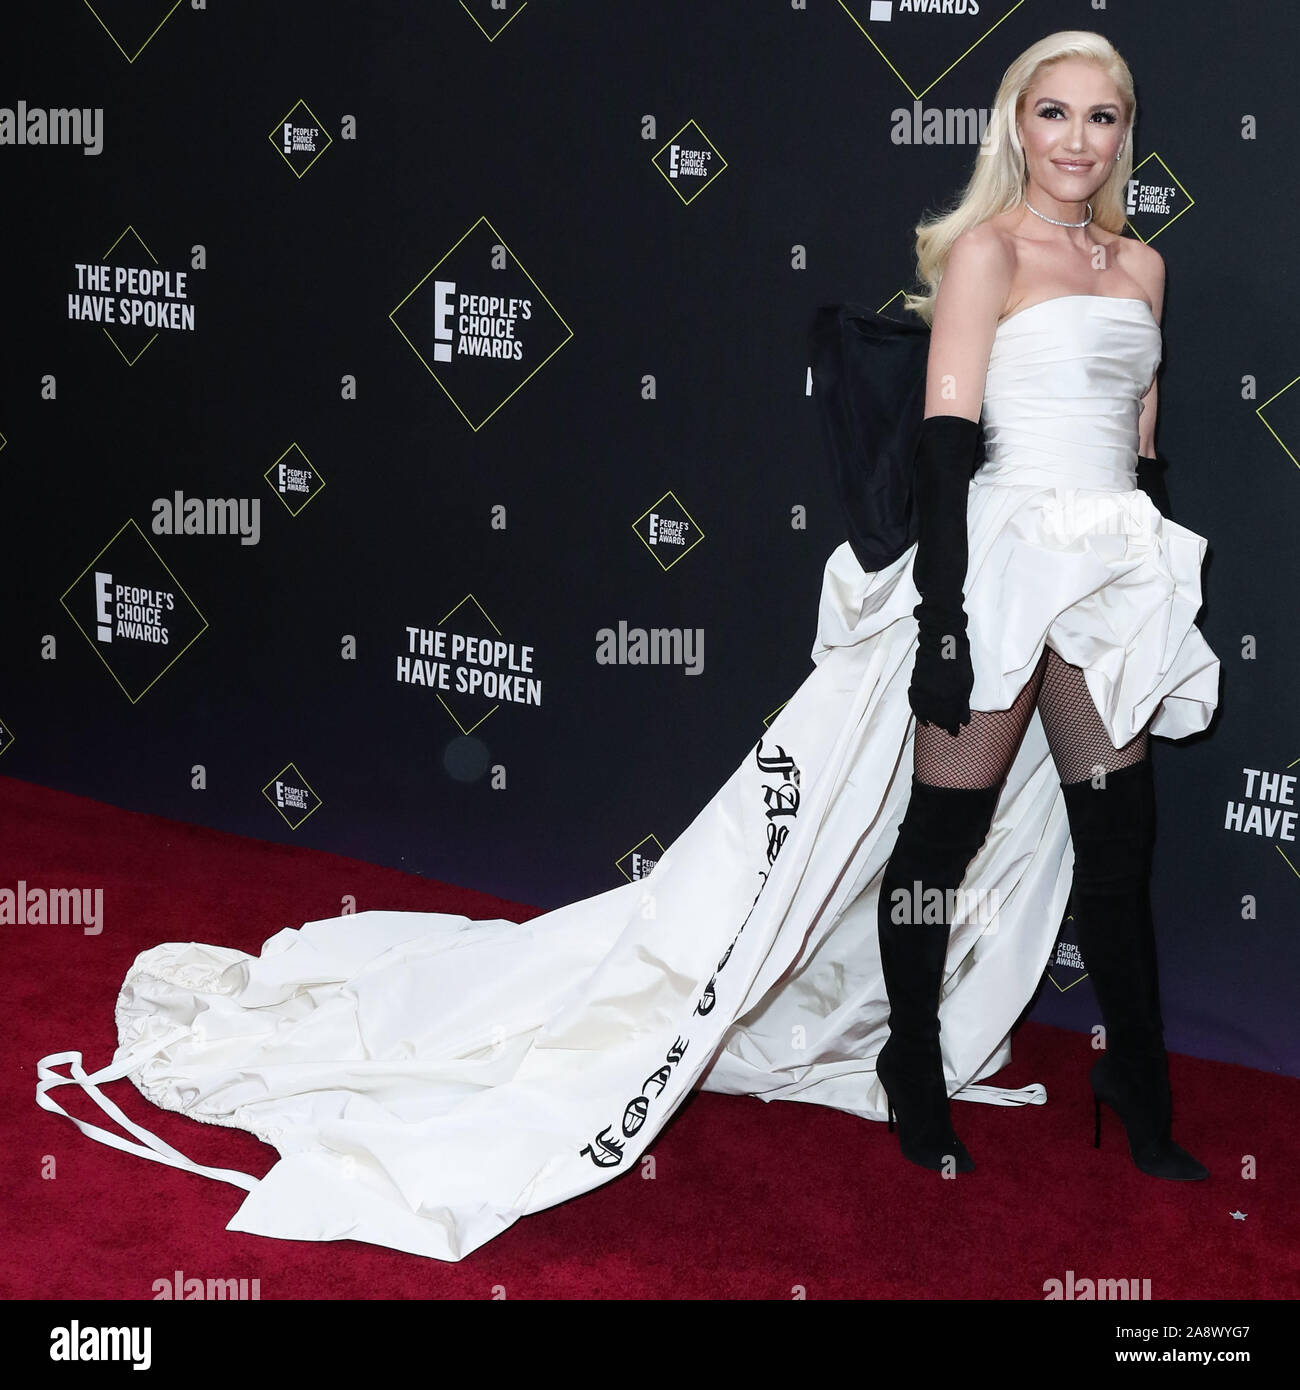 Sängerin Gwen Stefani tragen Vera Wang kommt an der 2019 E! Der Menschen Choice Awards gehalten an Barker Hangar am 10. November 2019 in Santa Monica, Los Angeles, Kalifornien, USA. (Foto von Xavier Collin/Image Press Agency) Stockfoto